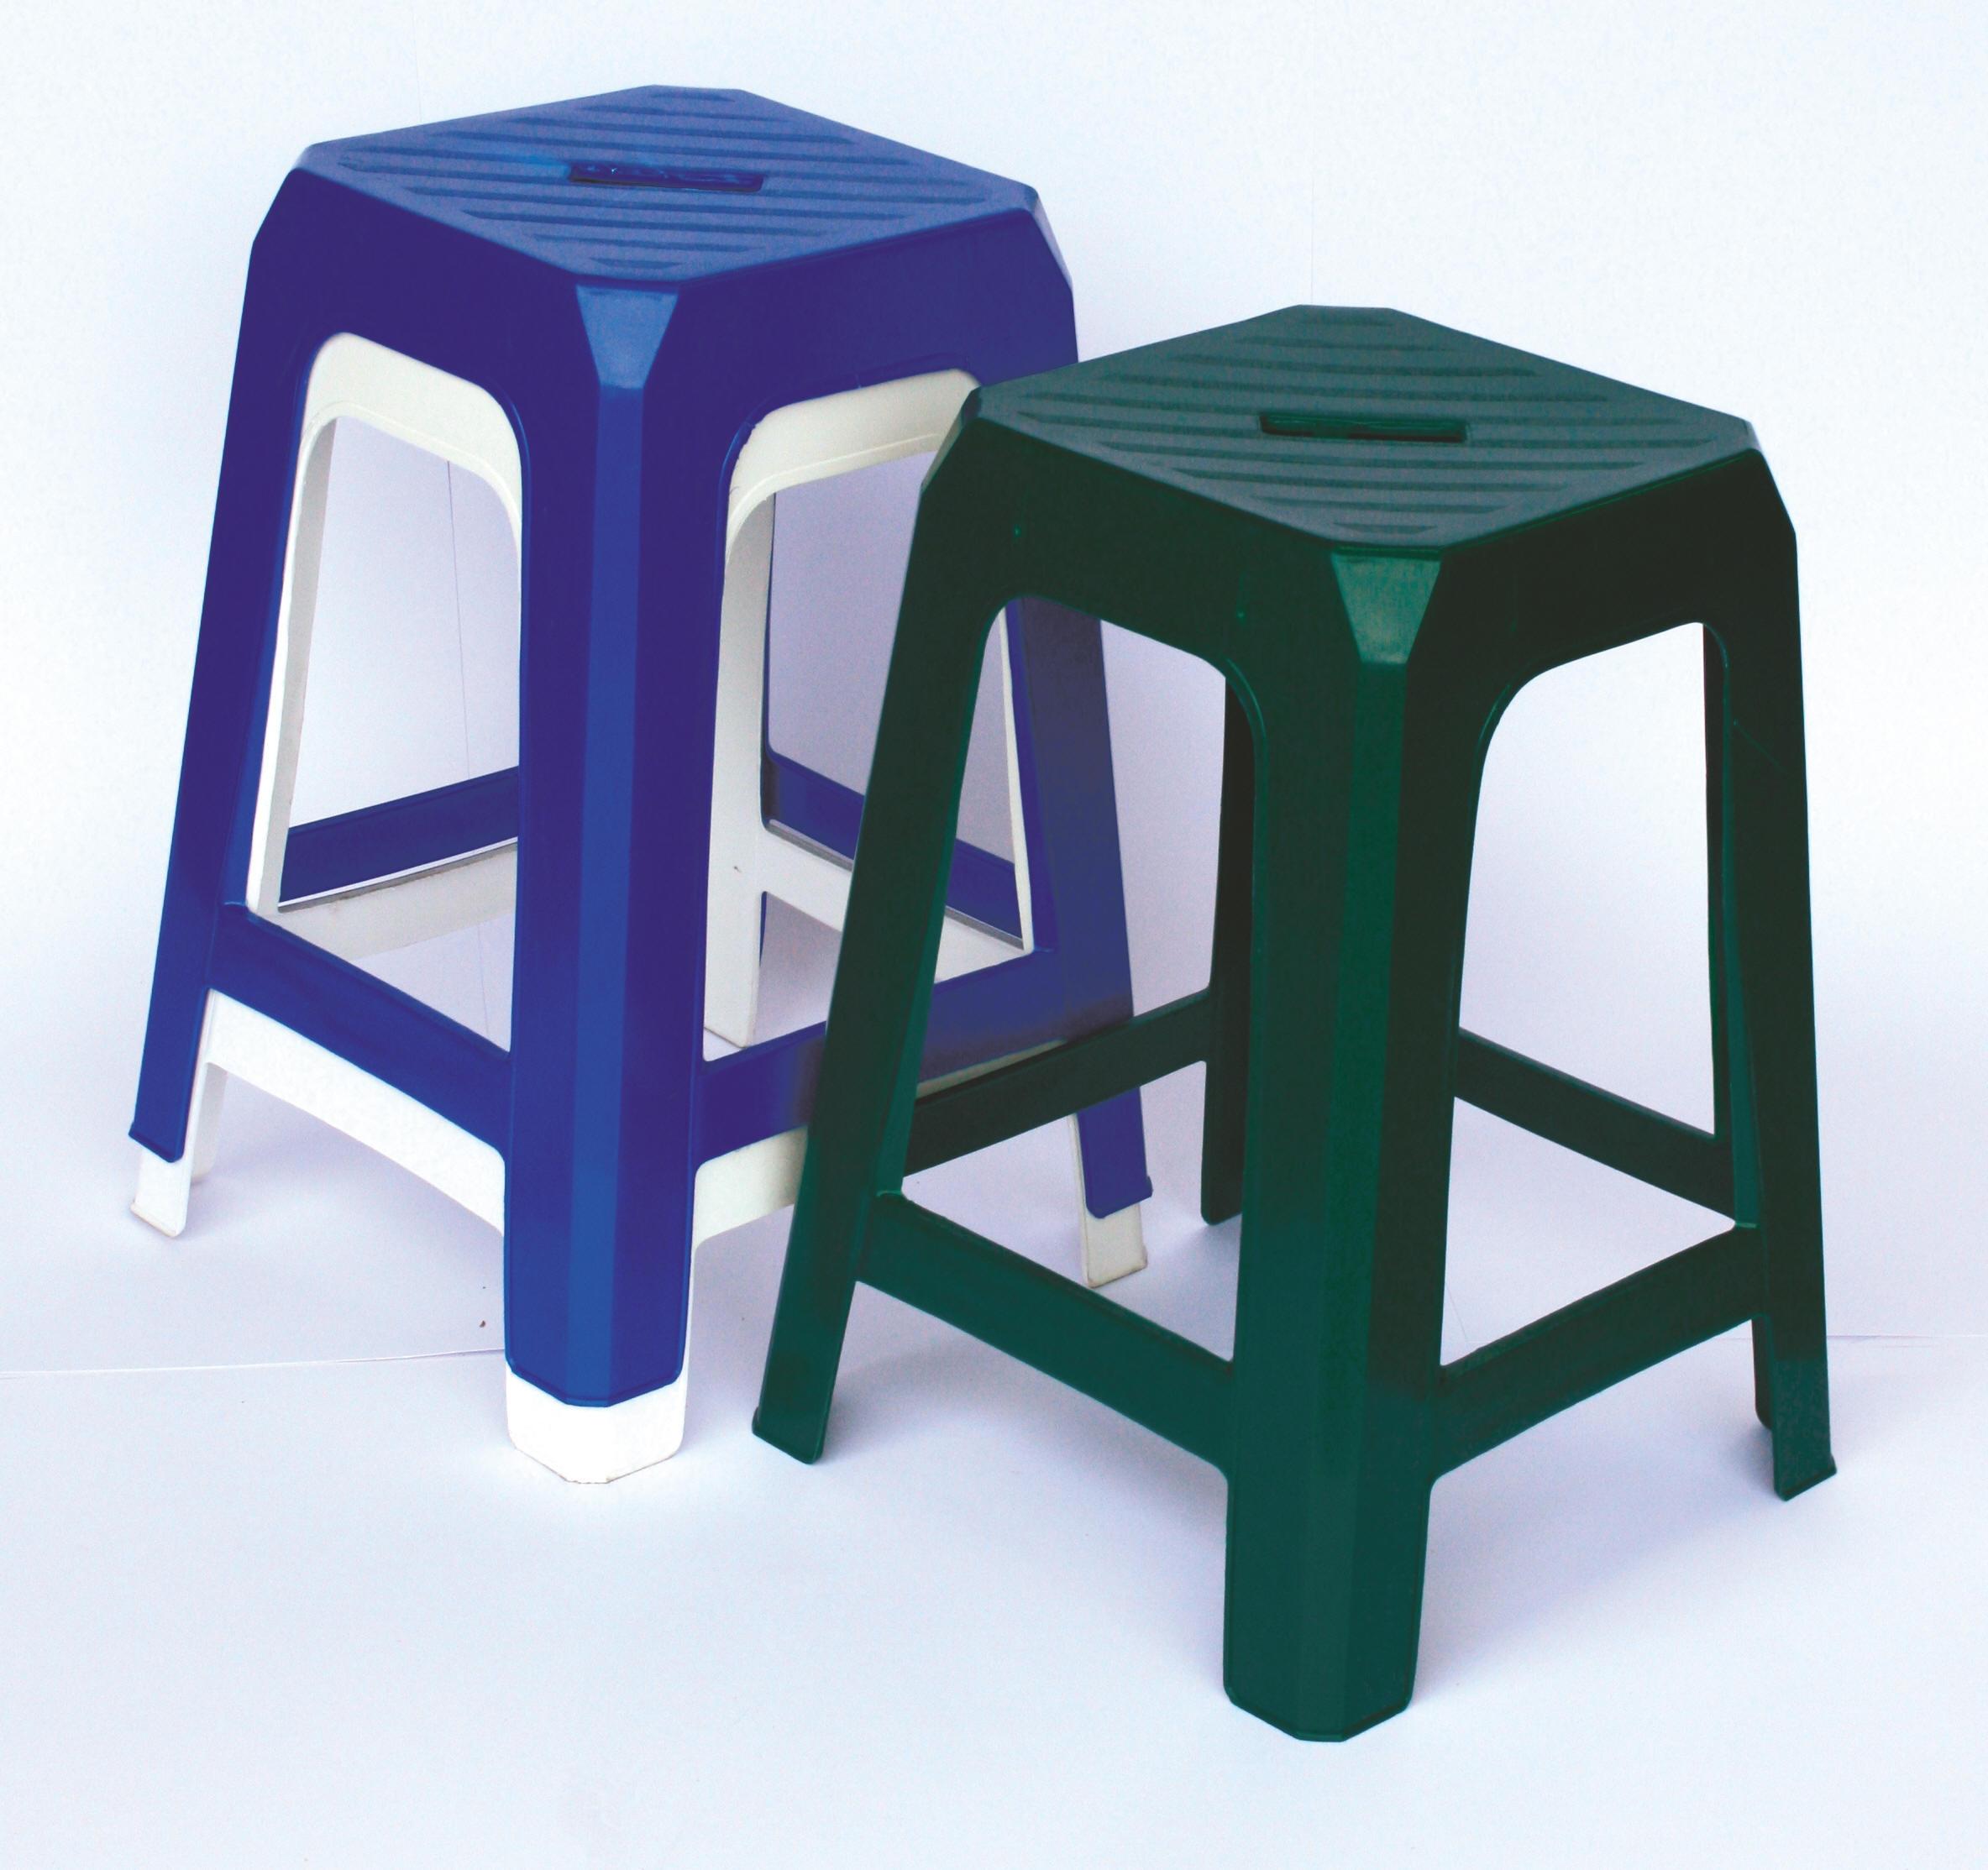 Stackable Stools Nz Rio Bar Stool 760mm Nz Full Size  : 3715186342 from www.crashtheinauguration.com size 2367 x 2227 jpeg 1525kB